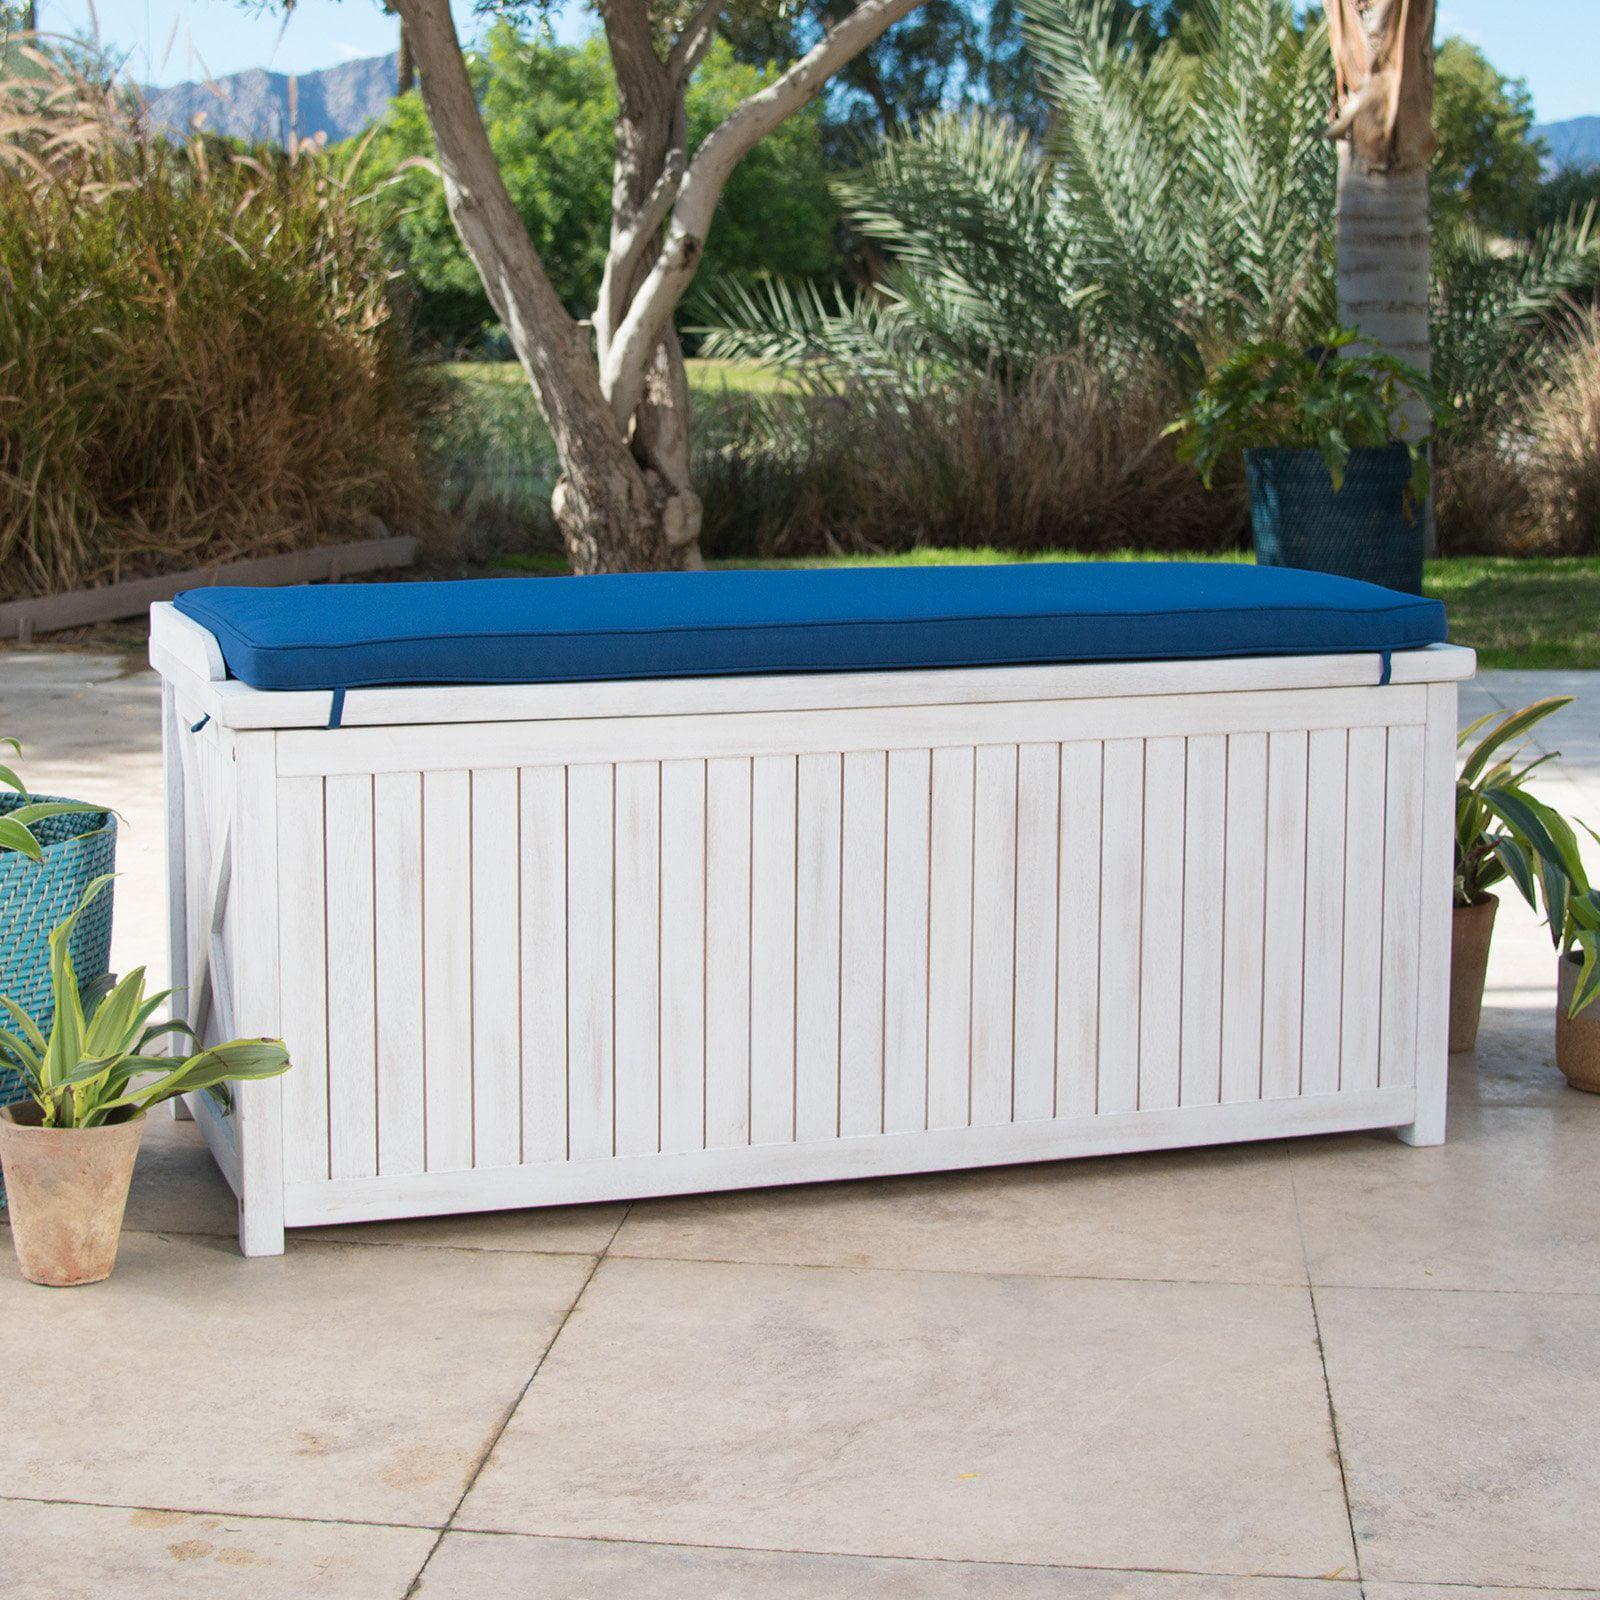 Belham Living Brighton Beach 48 in. Outdoor Storage Deck Box with Cushion White by